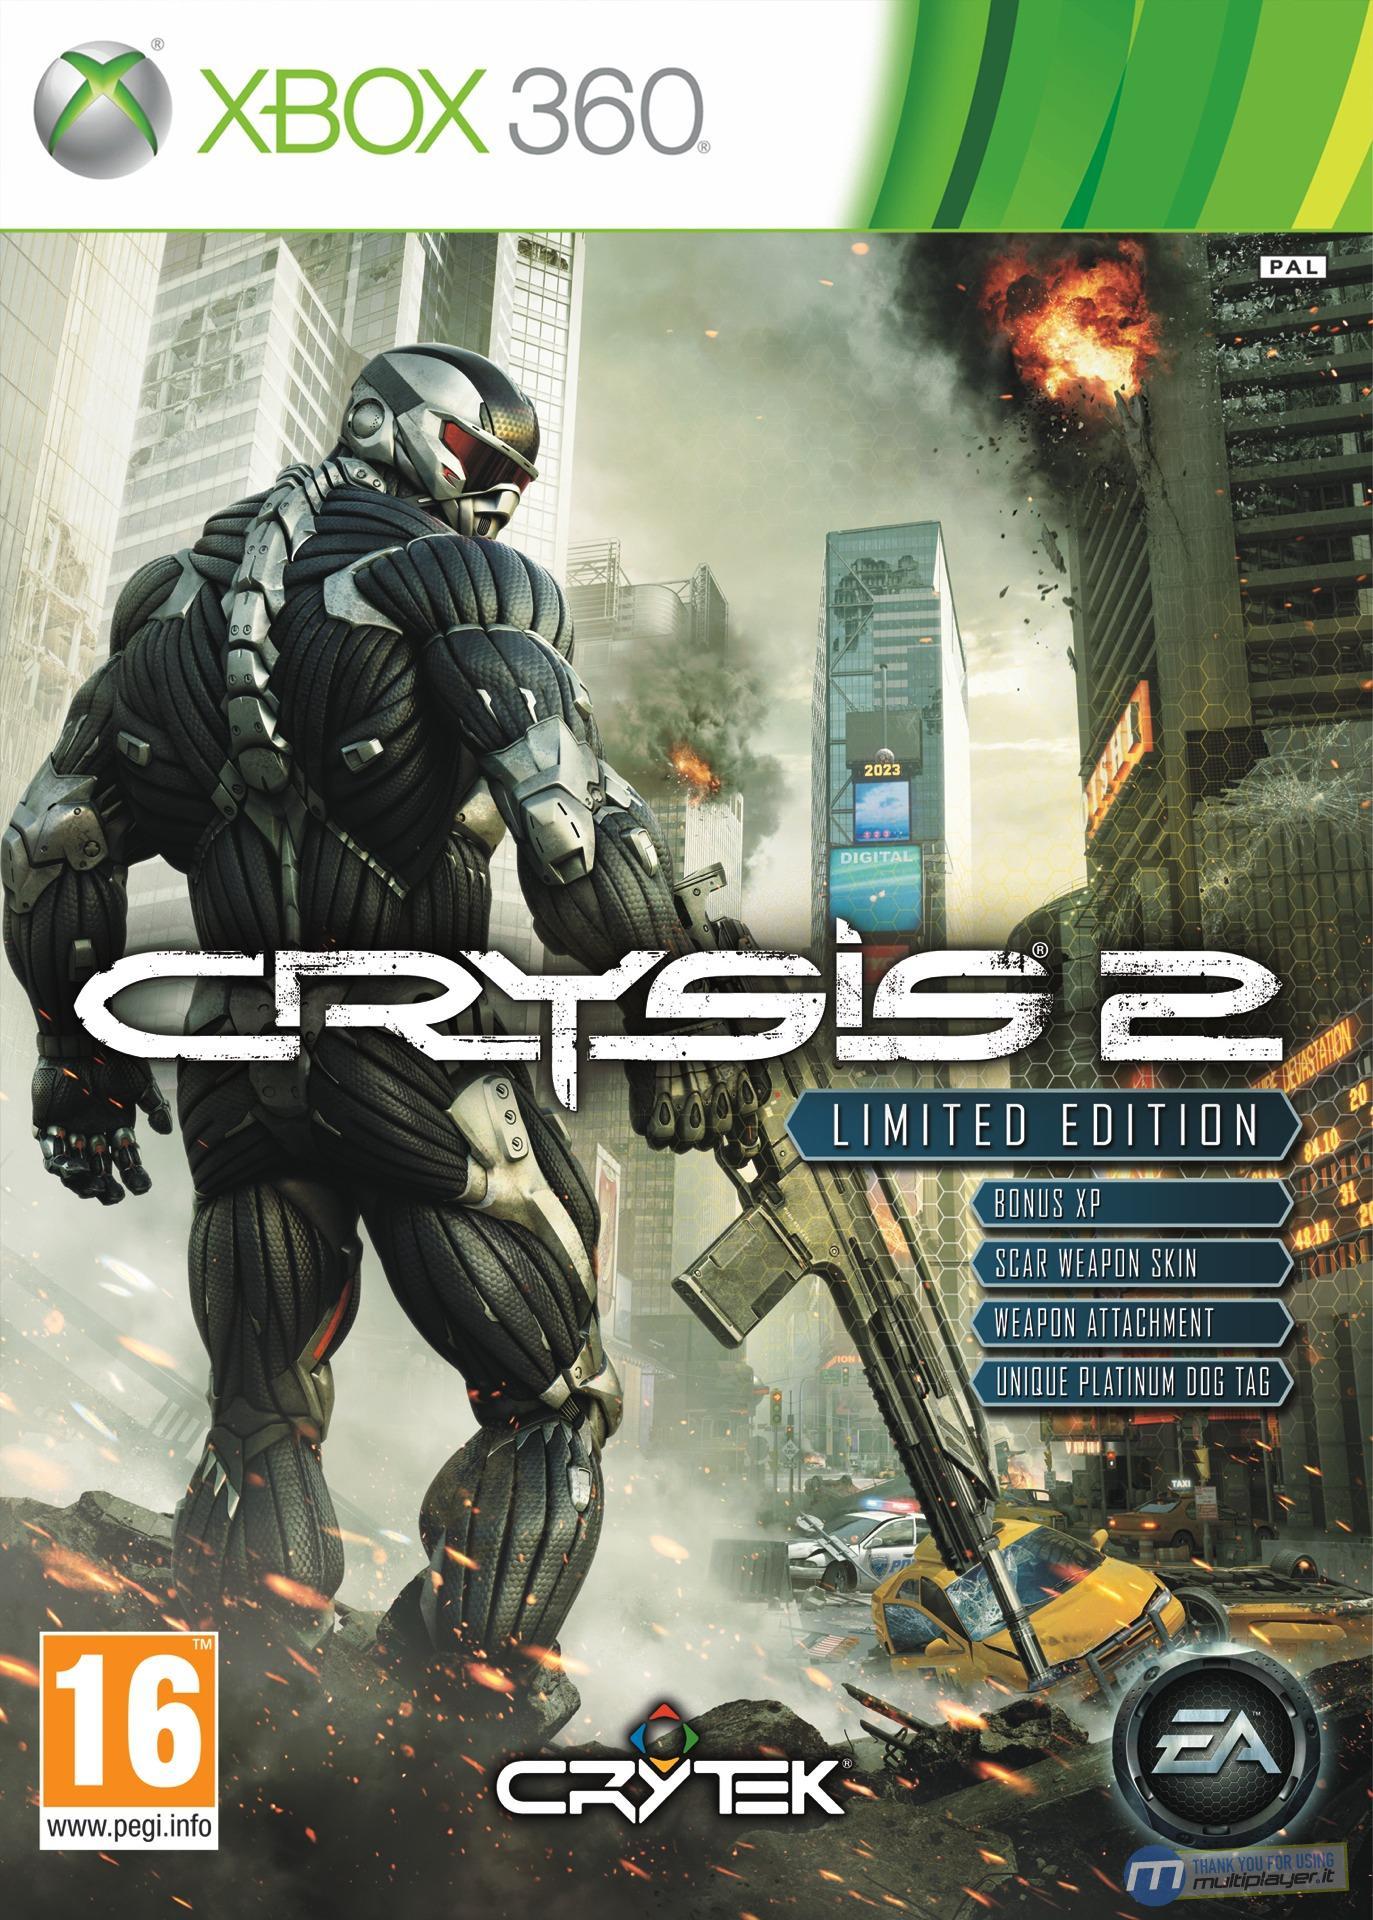 EA Crysis 2 (X360)